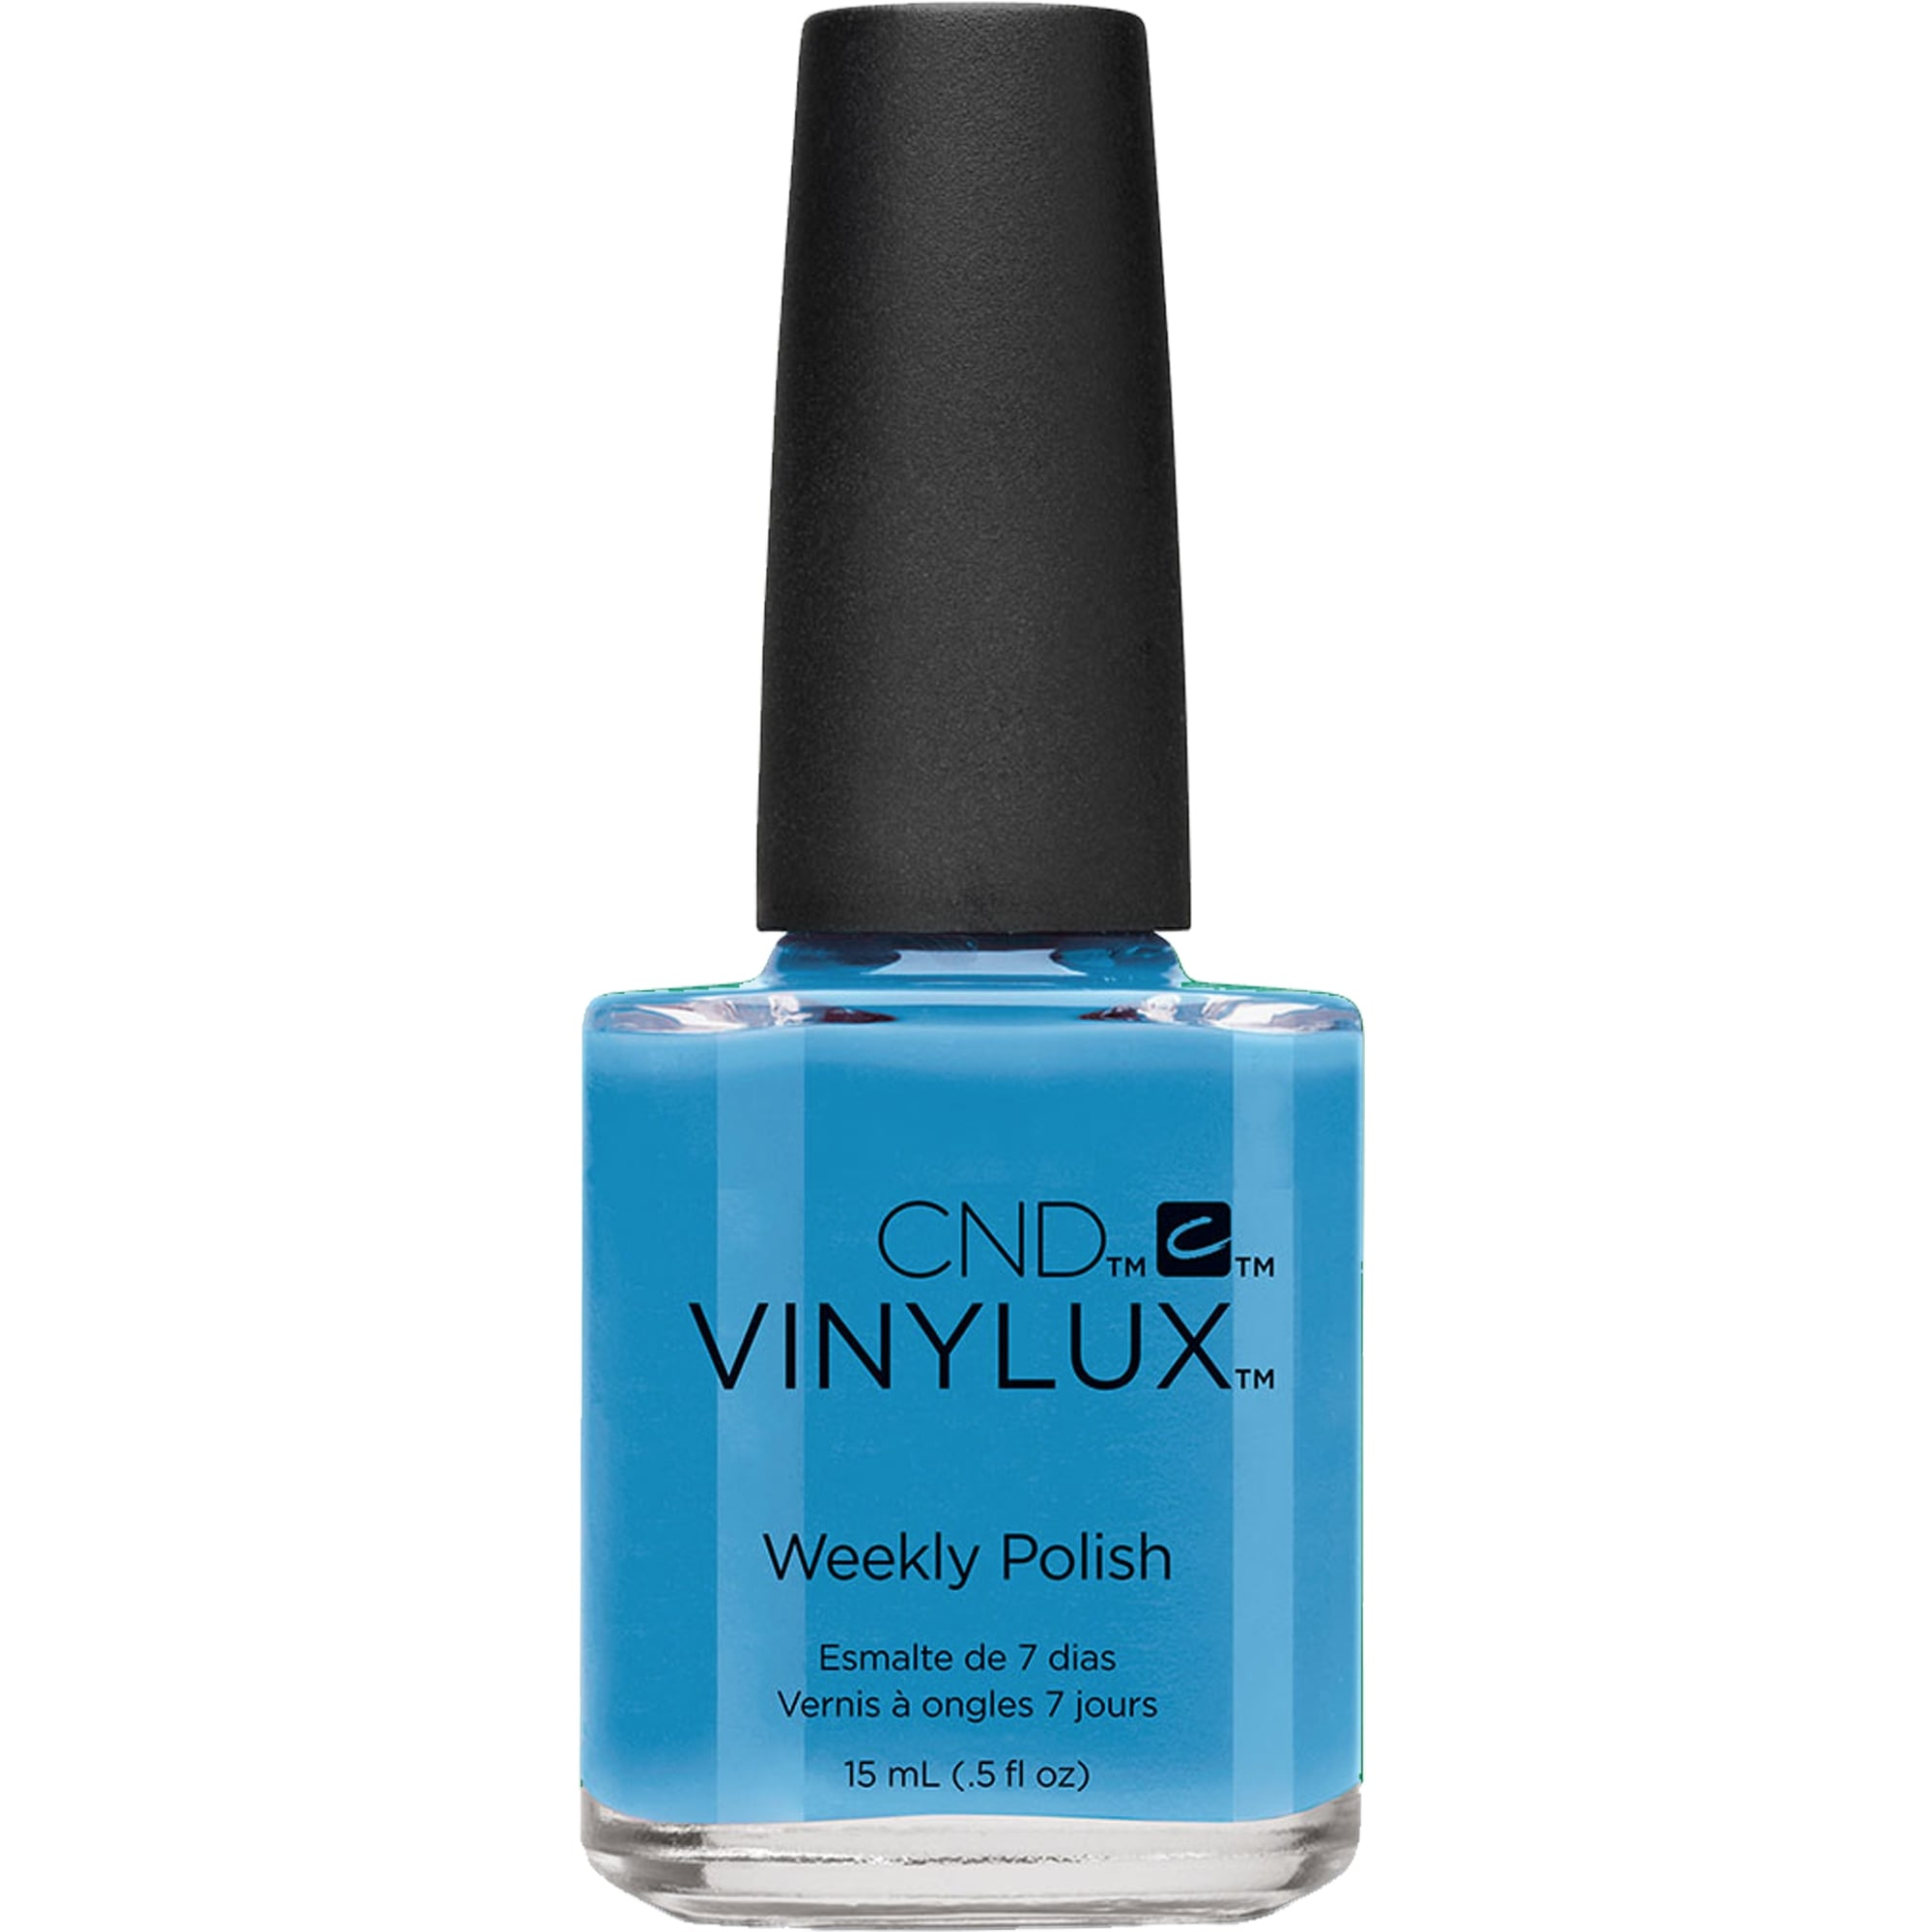 Cnd Vinylux Art Vandal Weekly Nail Polish 2016 Digi Teal